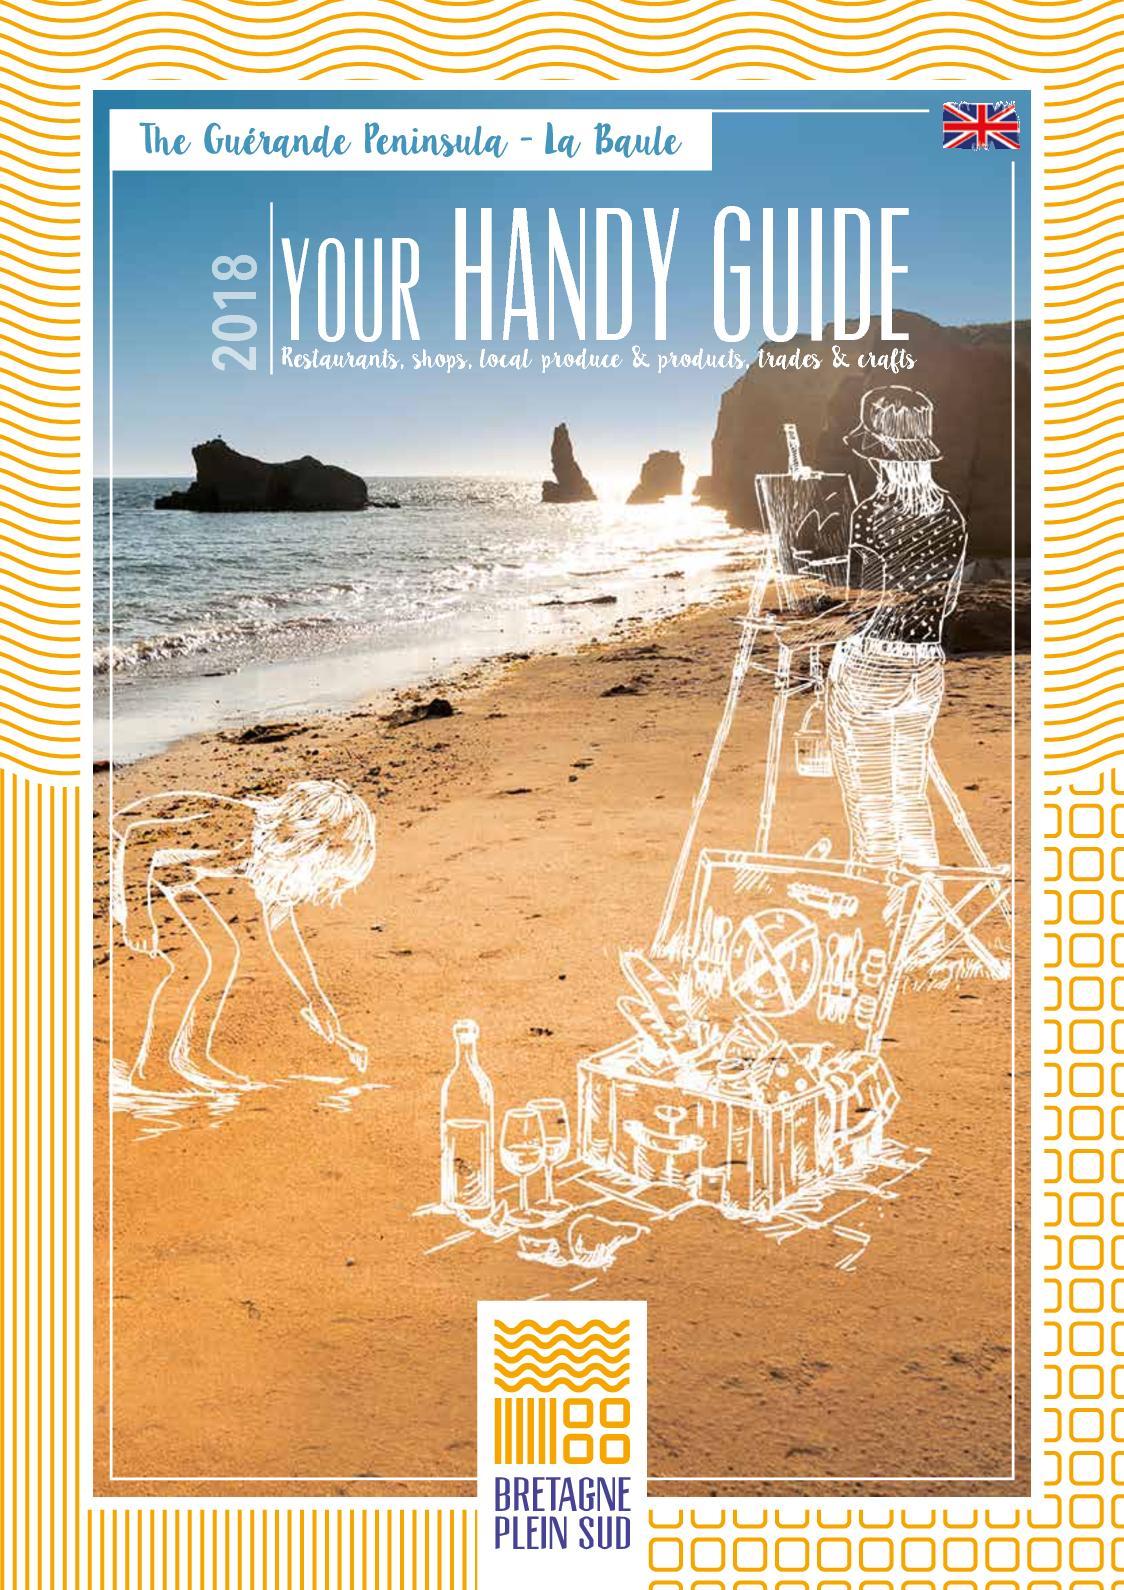 Calaméo - Your Handy Guide 2018 - Bretagne Plein Sud - EN